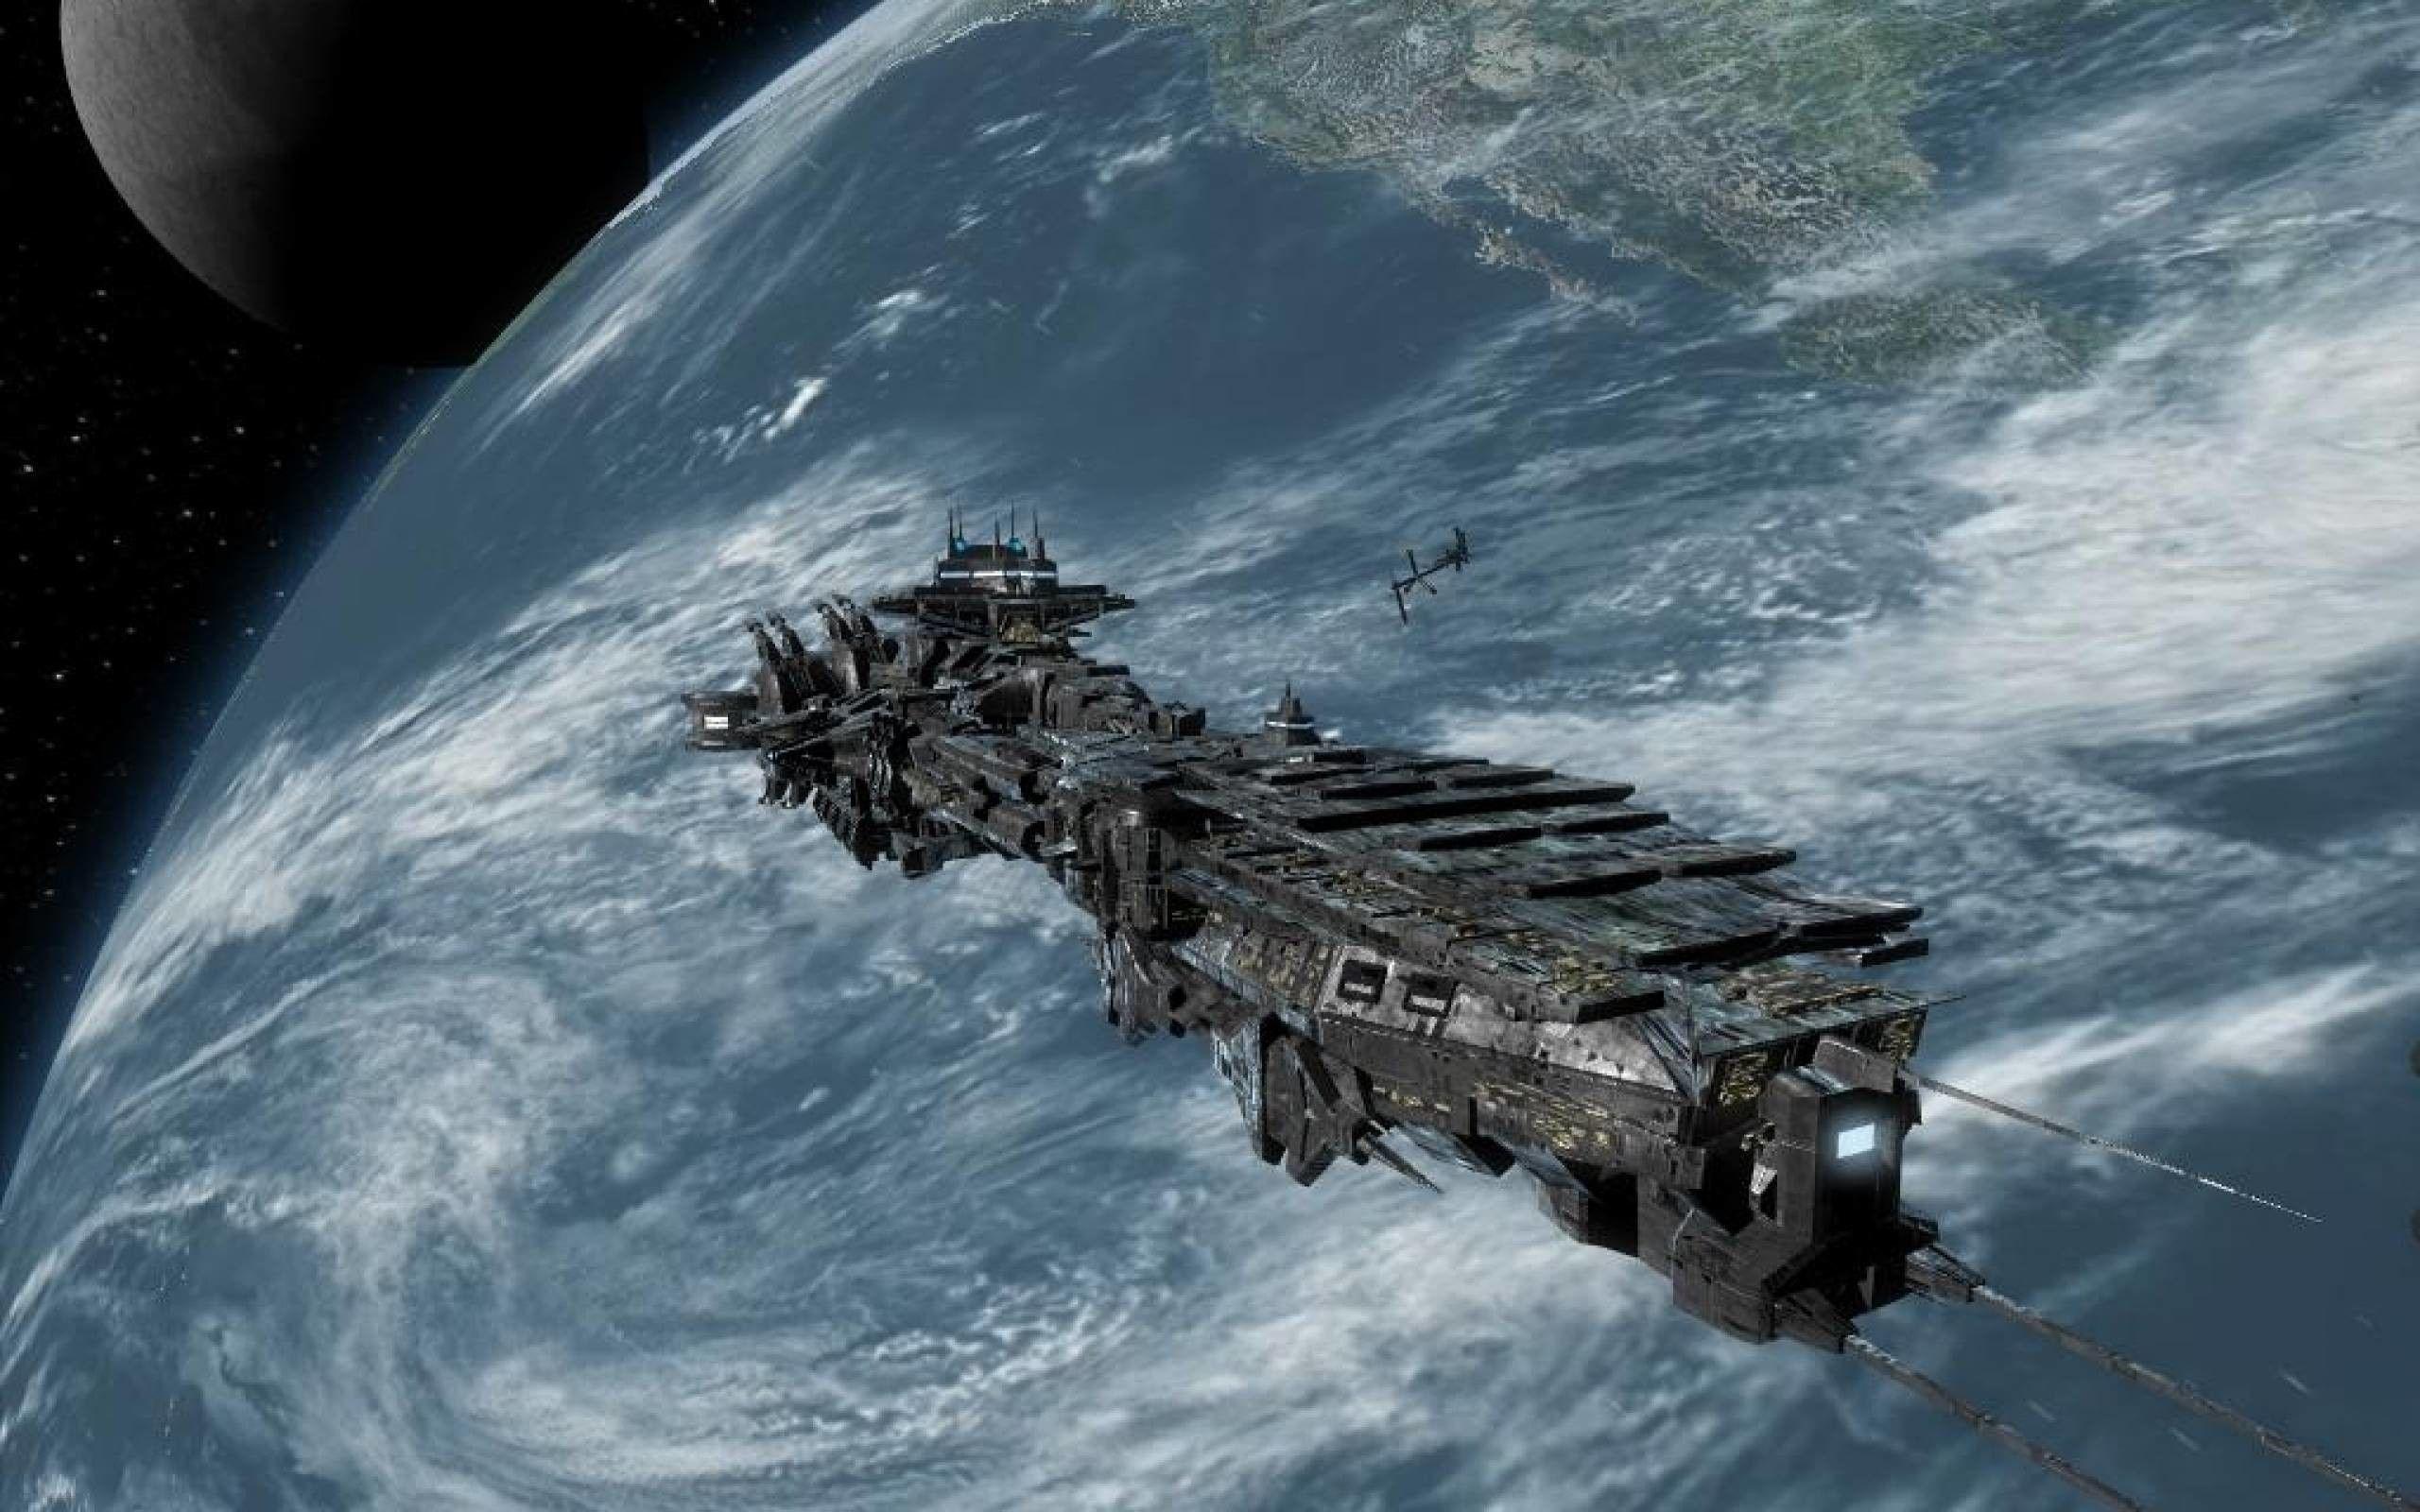 Sci-Fi Ship Wallpapers - Top Free Sci-Fi Ship Backgrounds - WallpaperAccess